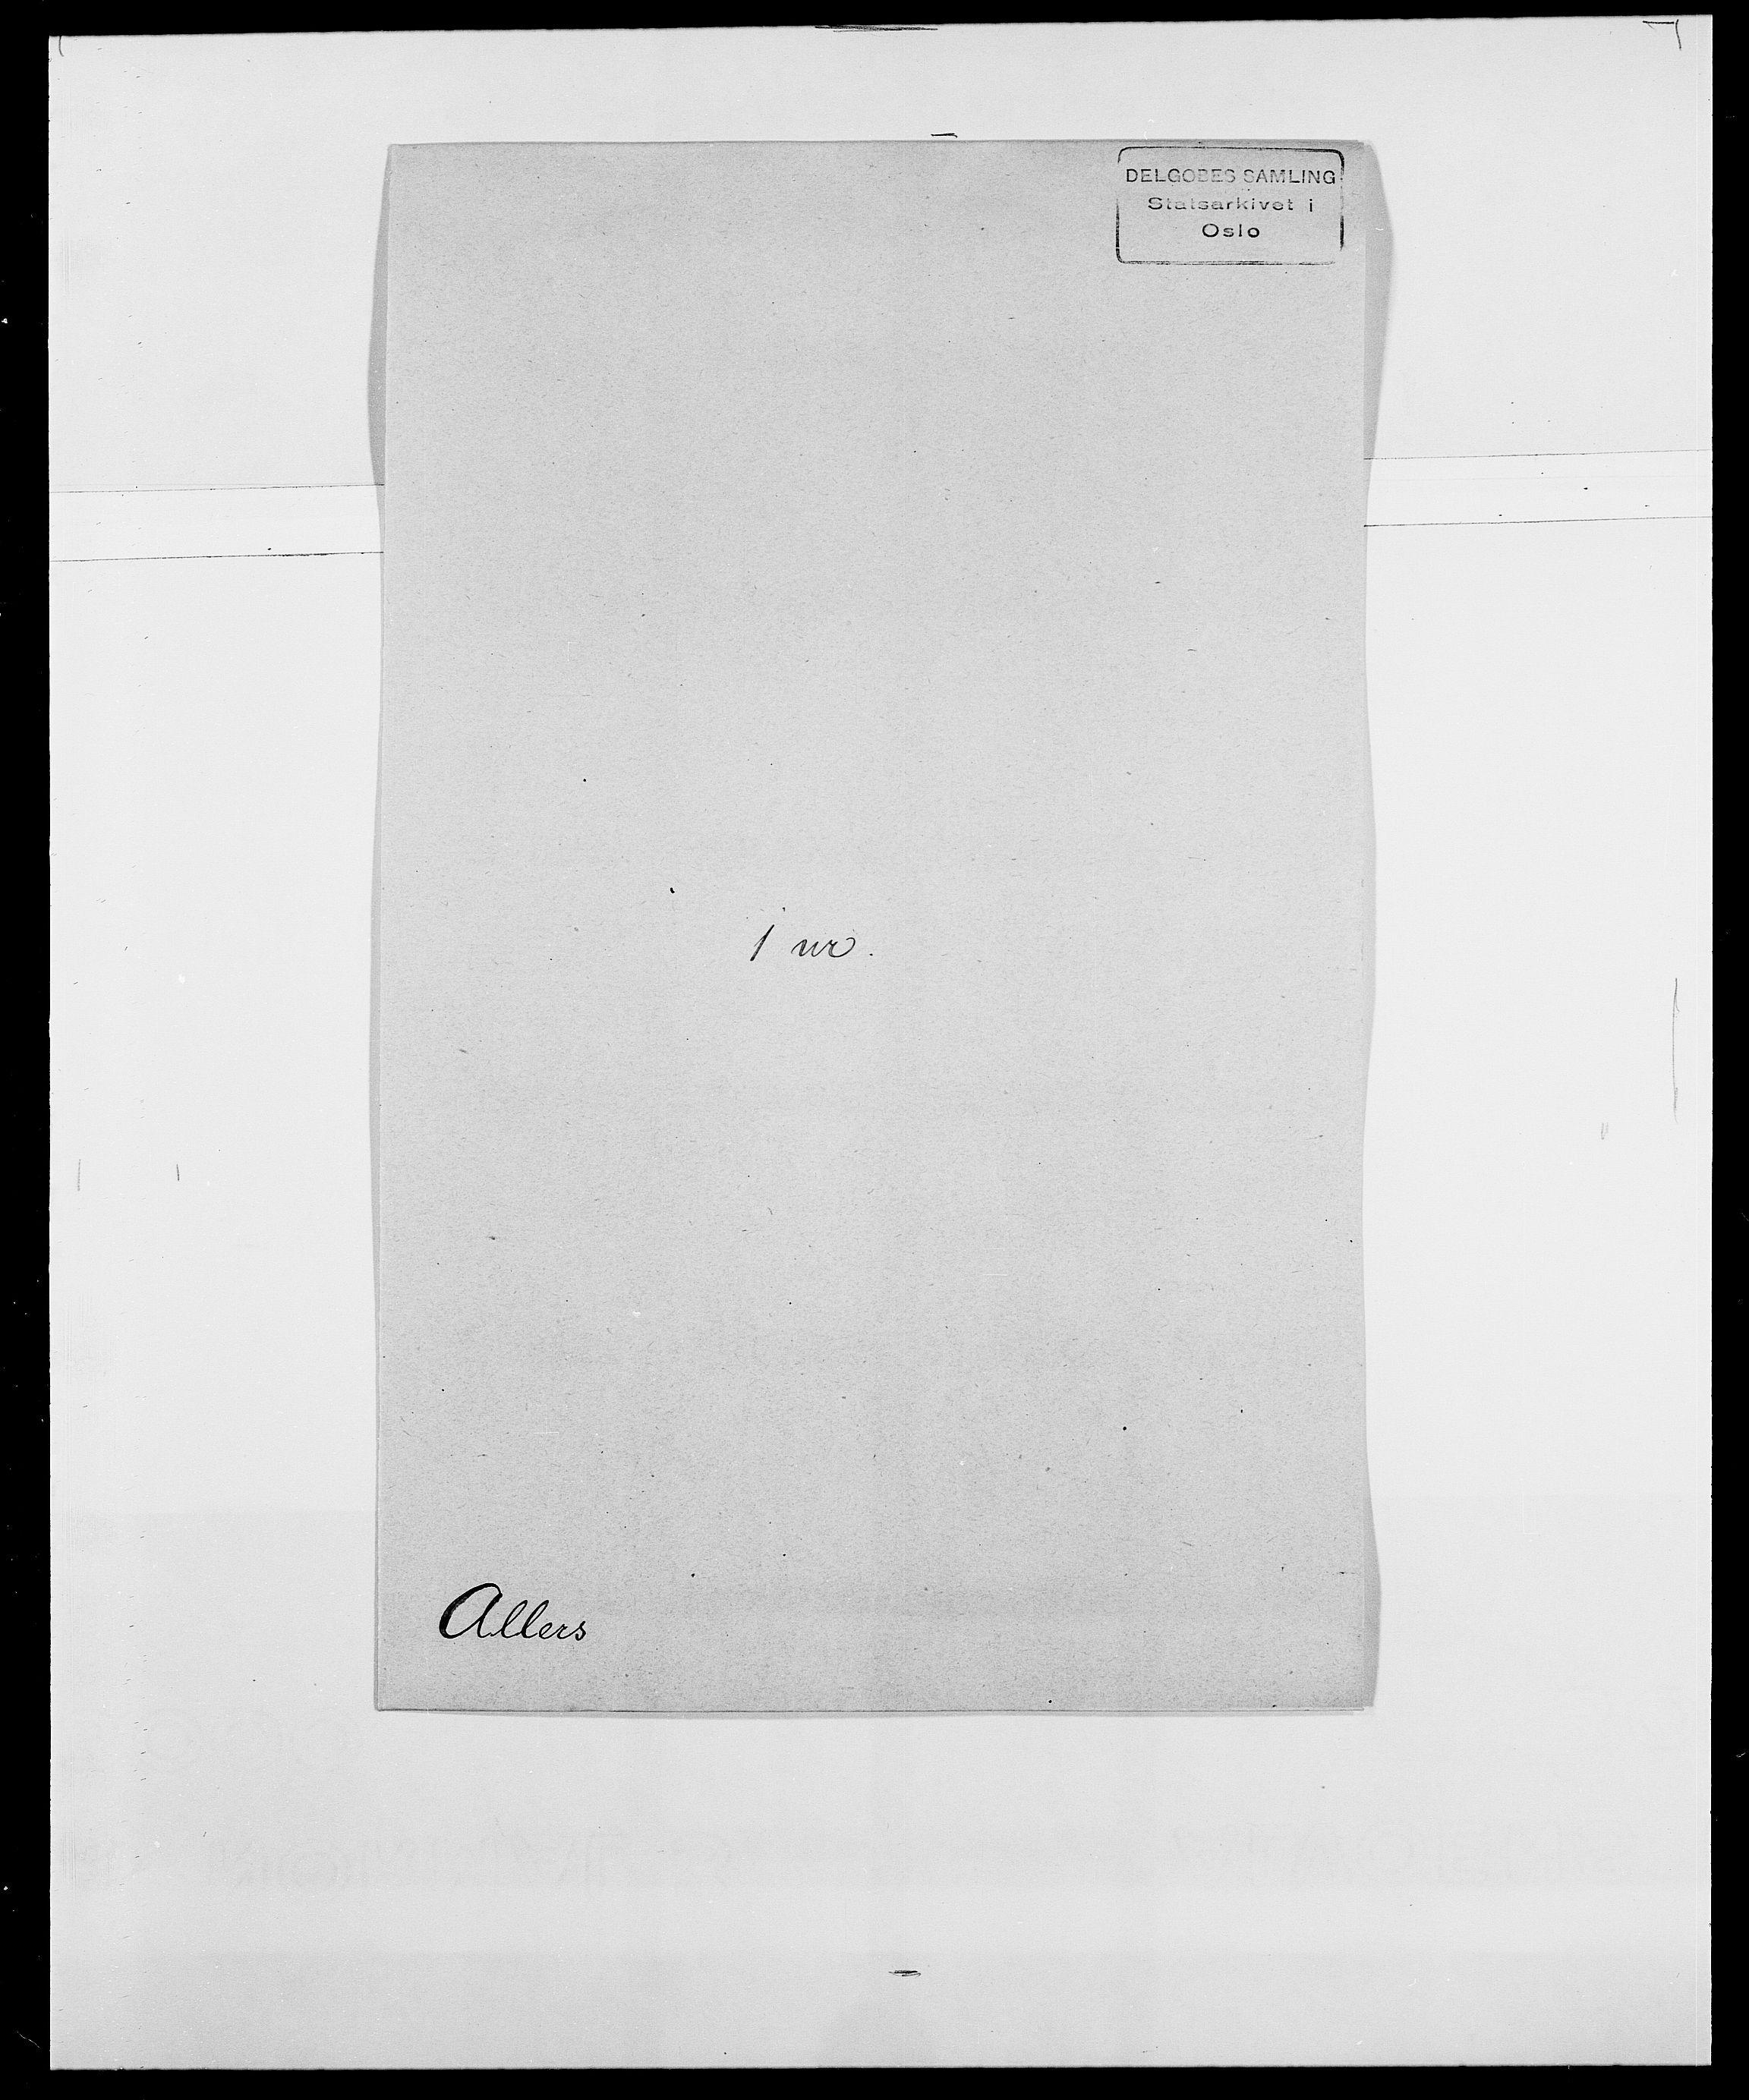 SAO, Delgobe, Charles Antoine - samling, D/Da/L0001: Aabye - Angerman, s. 419